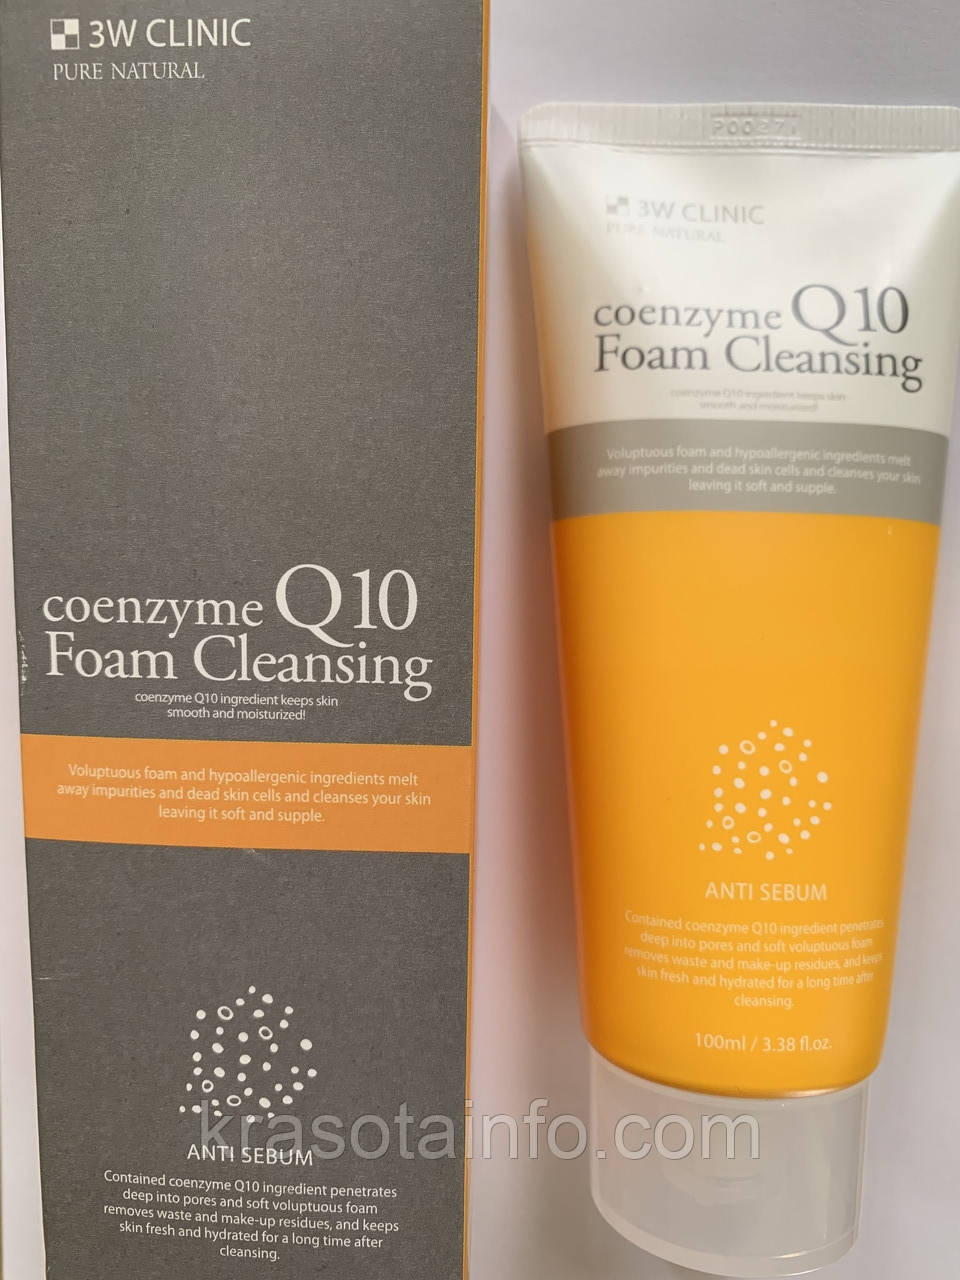 Пенка для умывания с коэнзимом Q10,   3W CLINIC Coenzyme Q10 Foam Cleansing, 100 мл